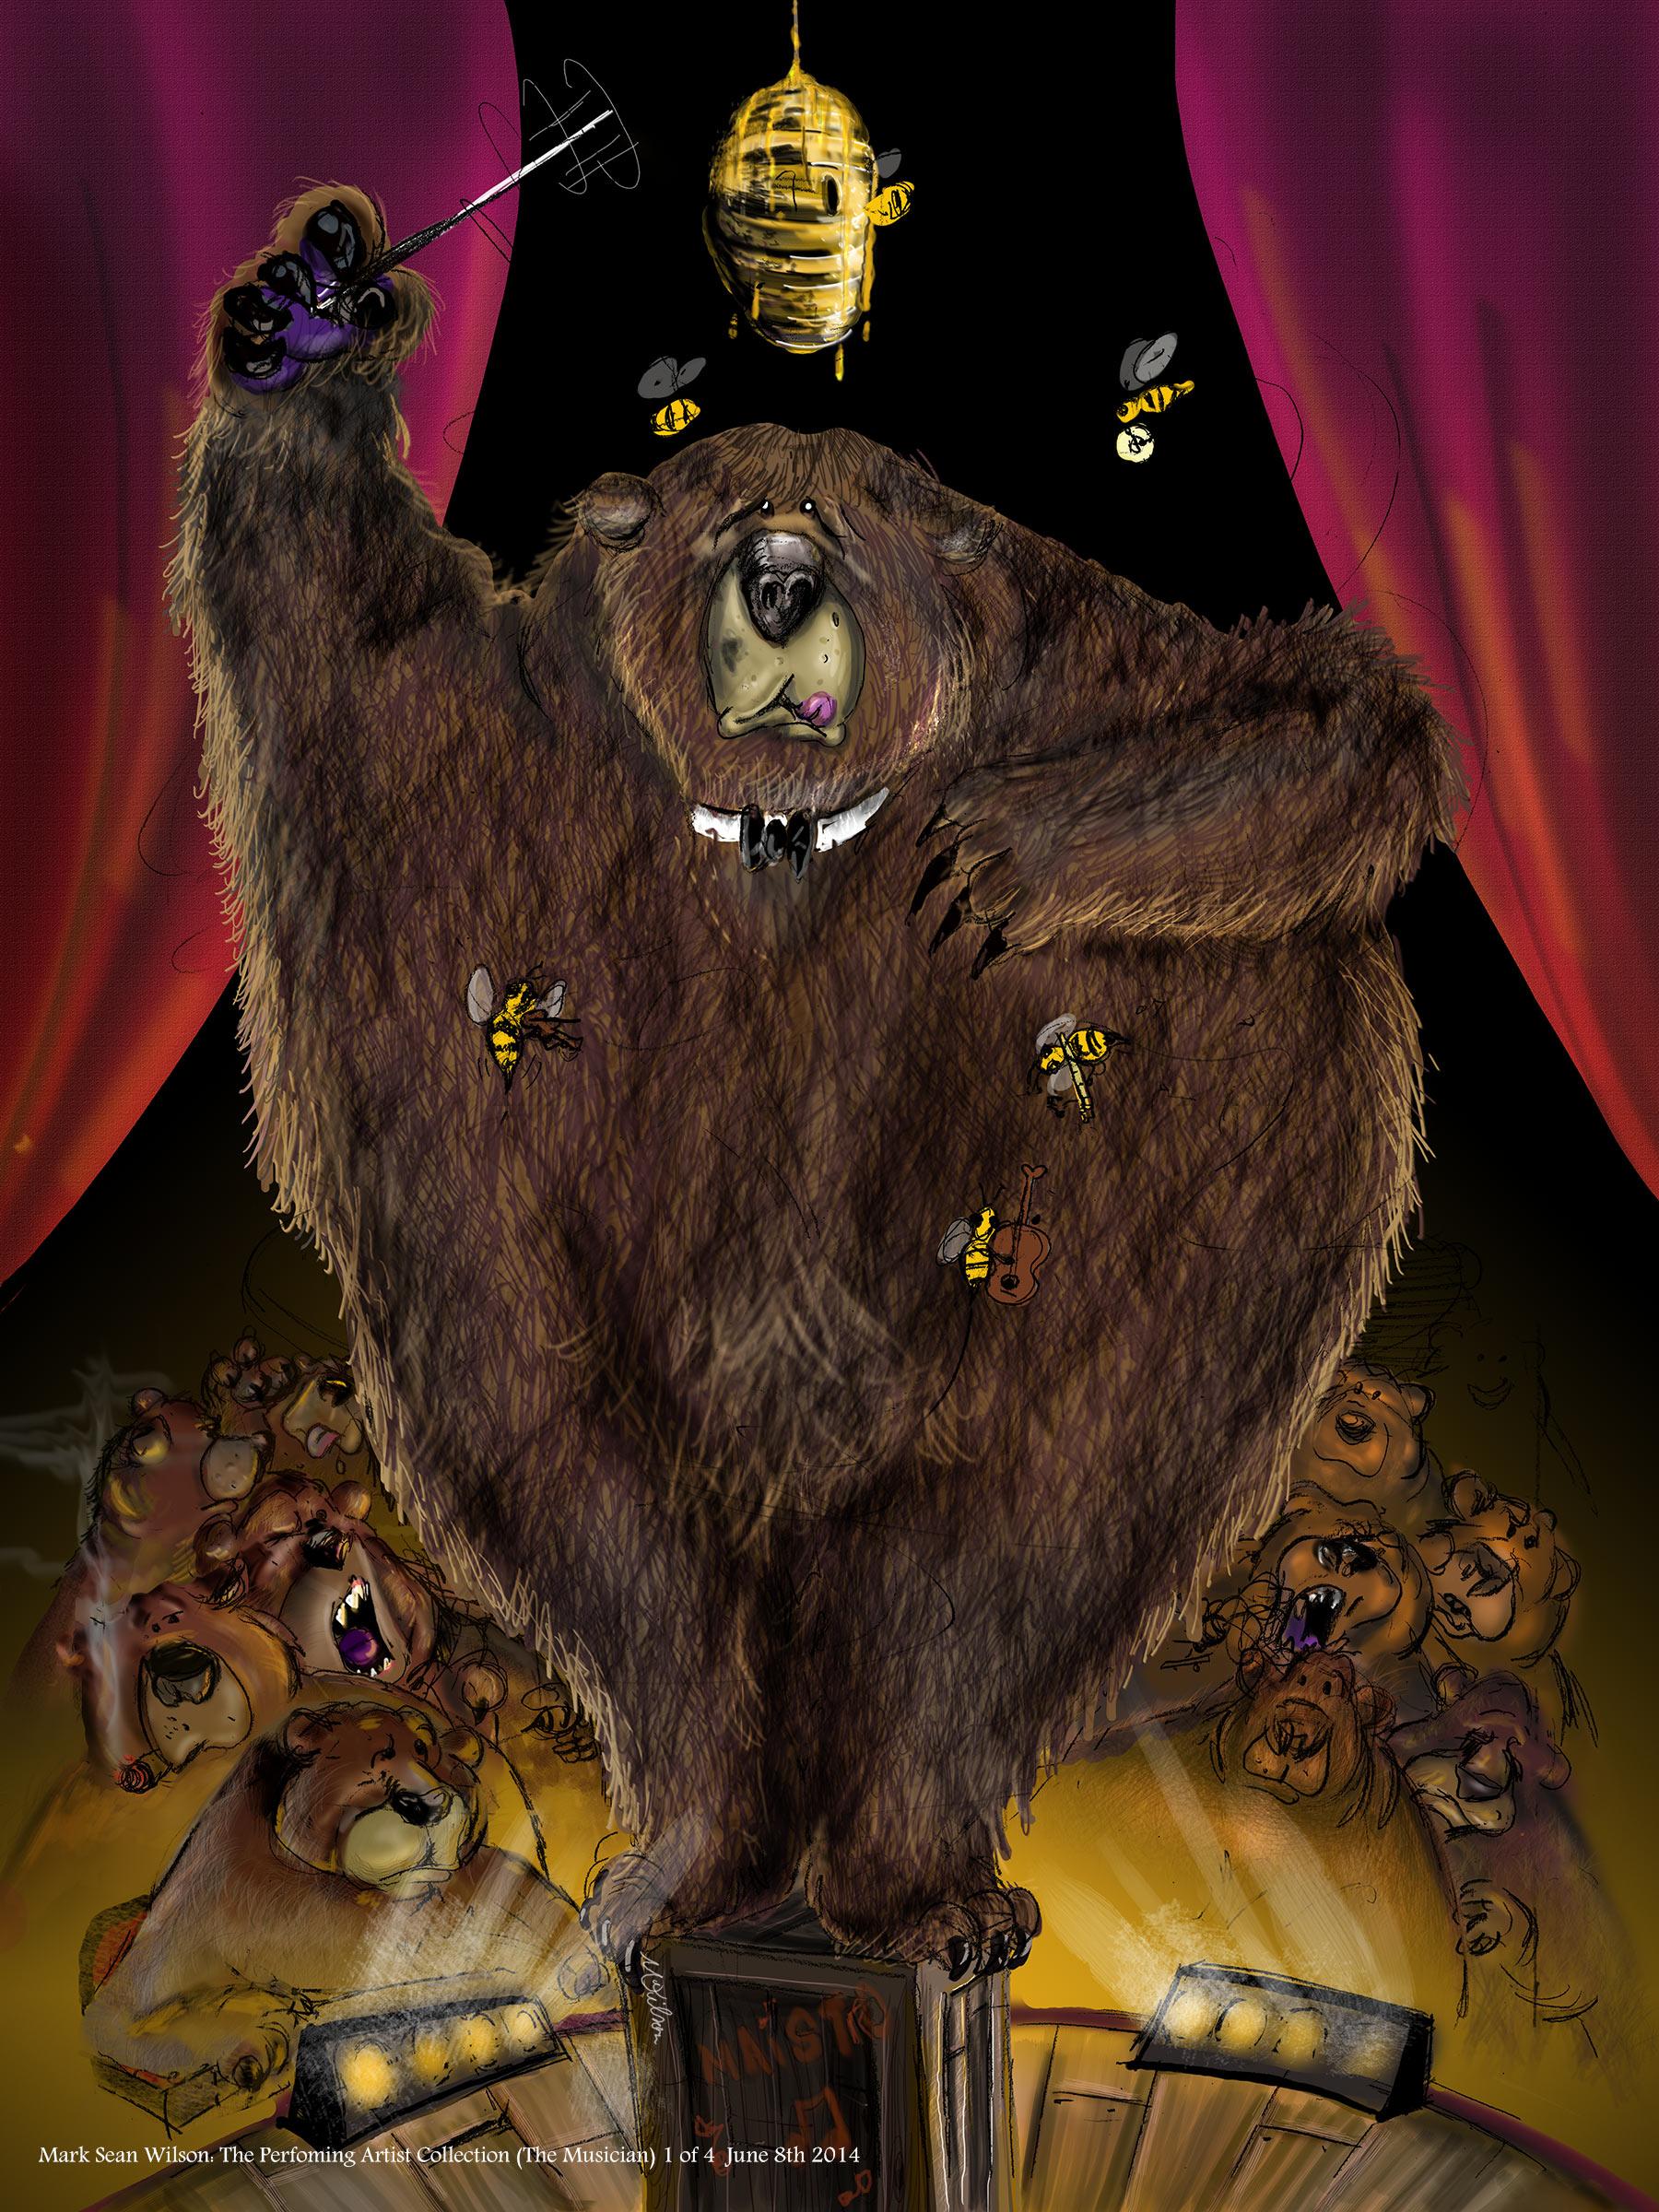 Conductor bear